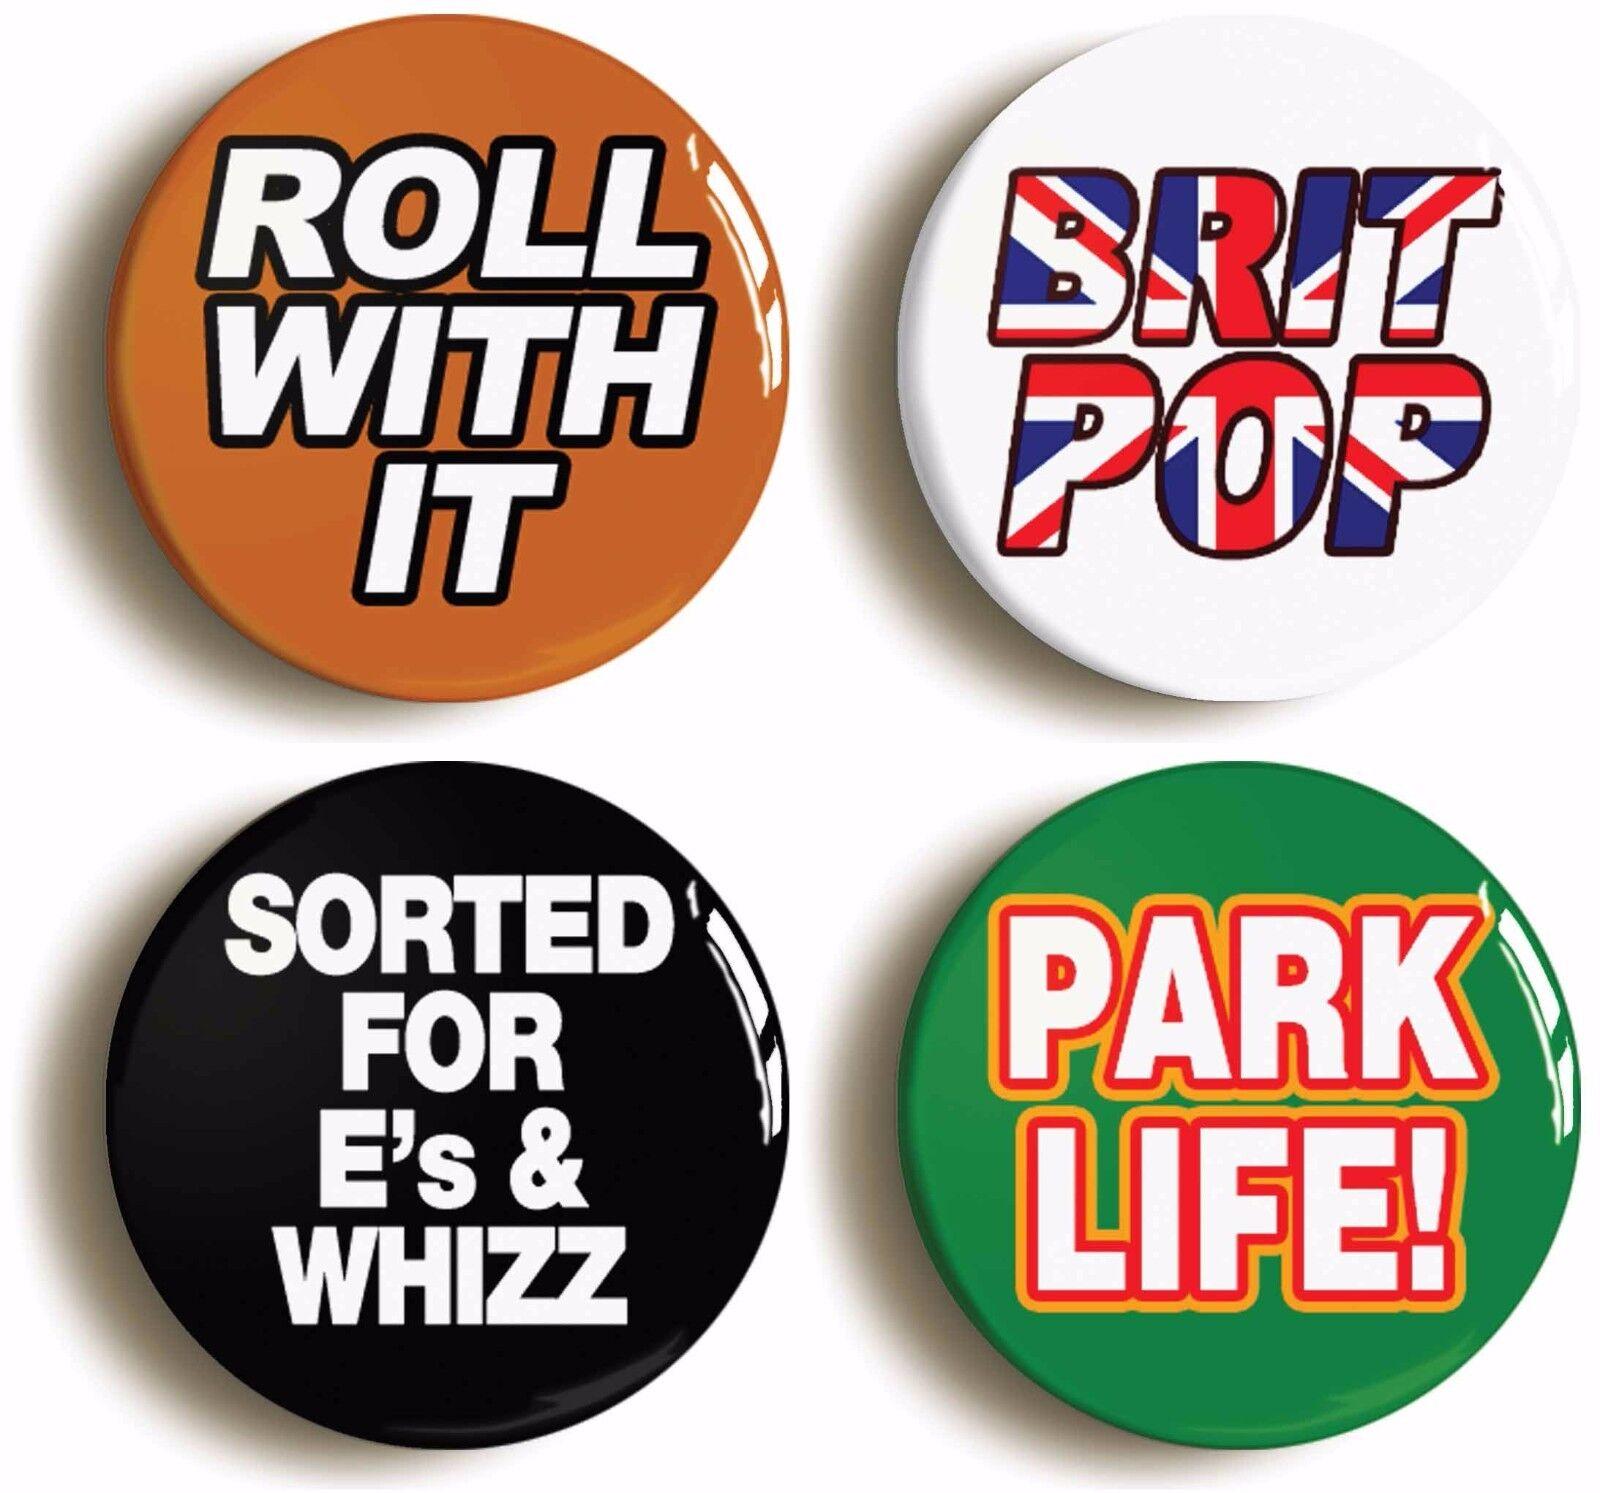 4 x britpop badges buttons pins (size is 1inch/25mm diameter) nineties